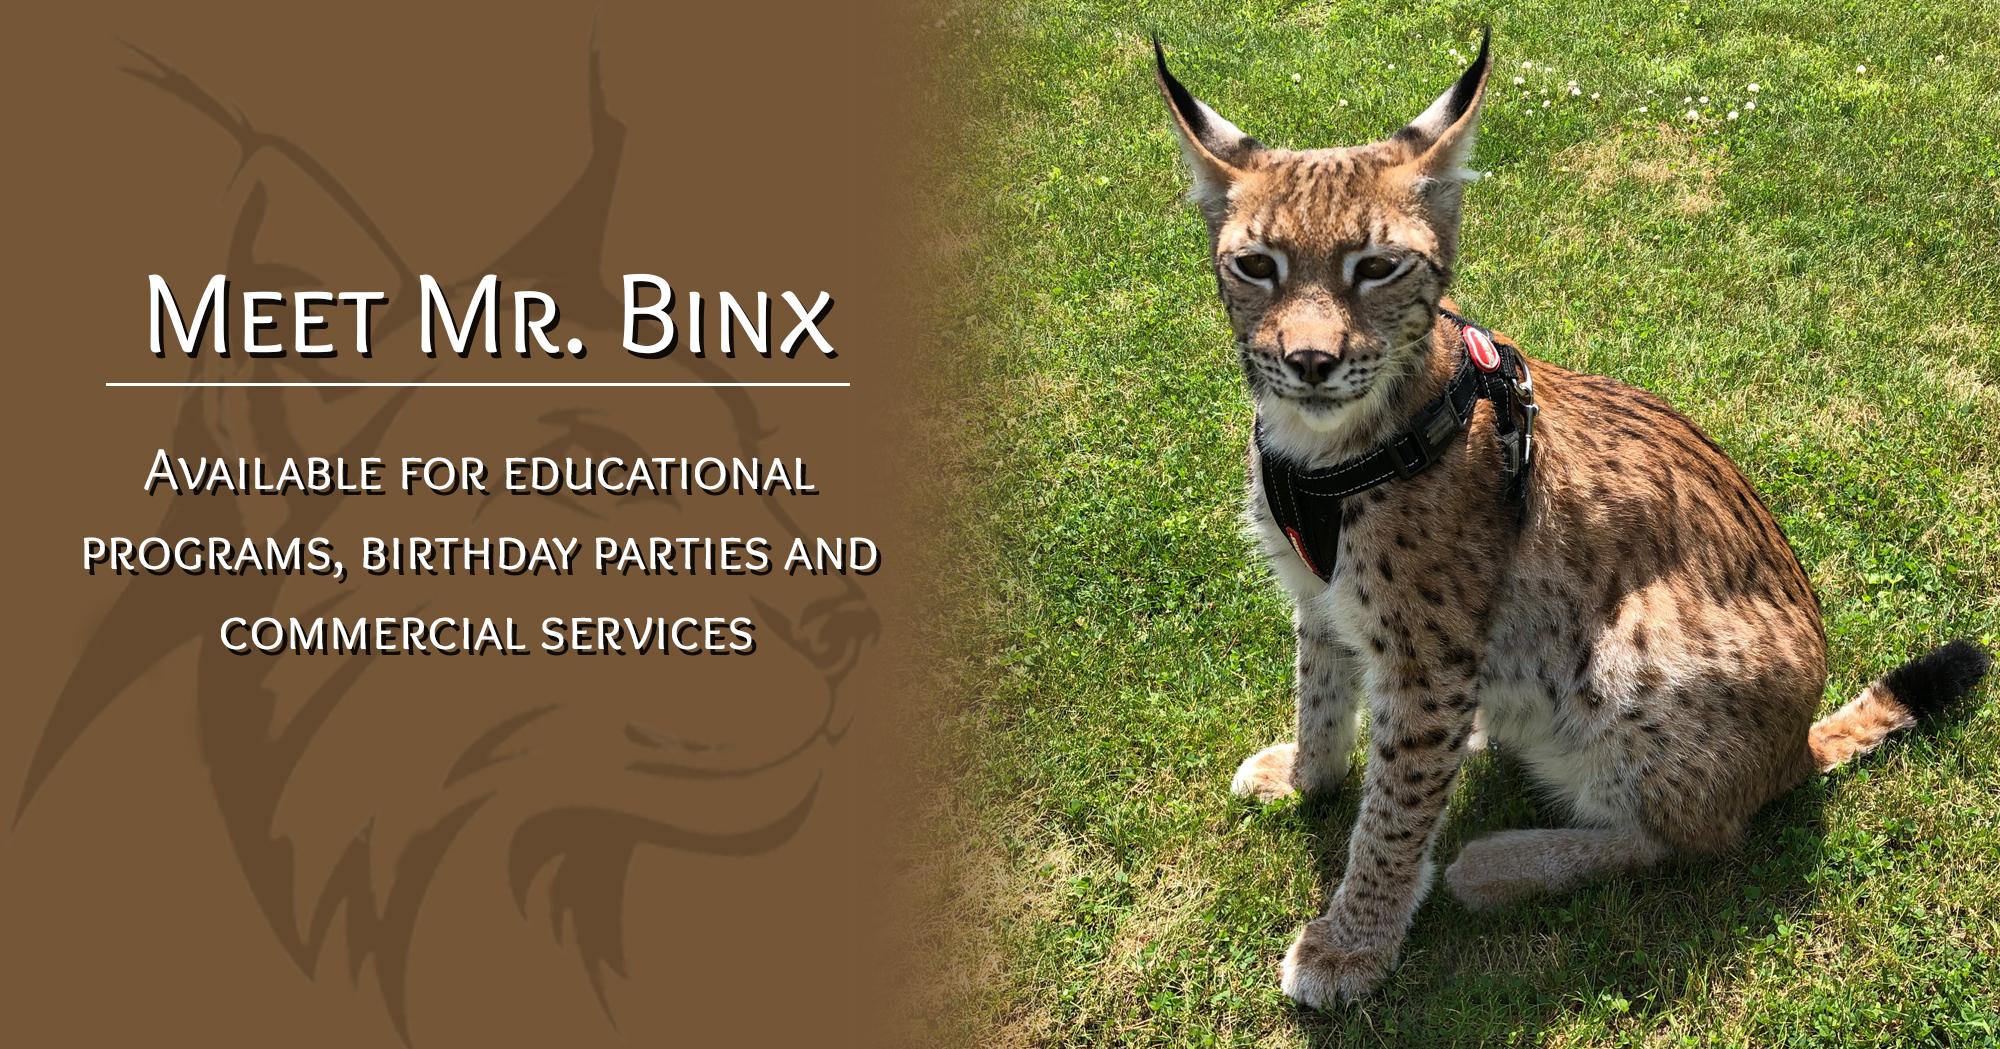 Meet Mr. Binx